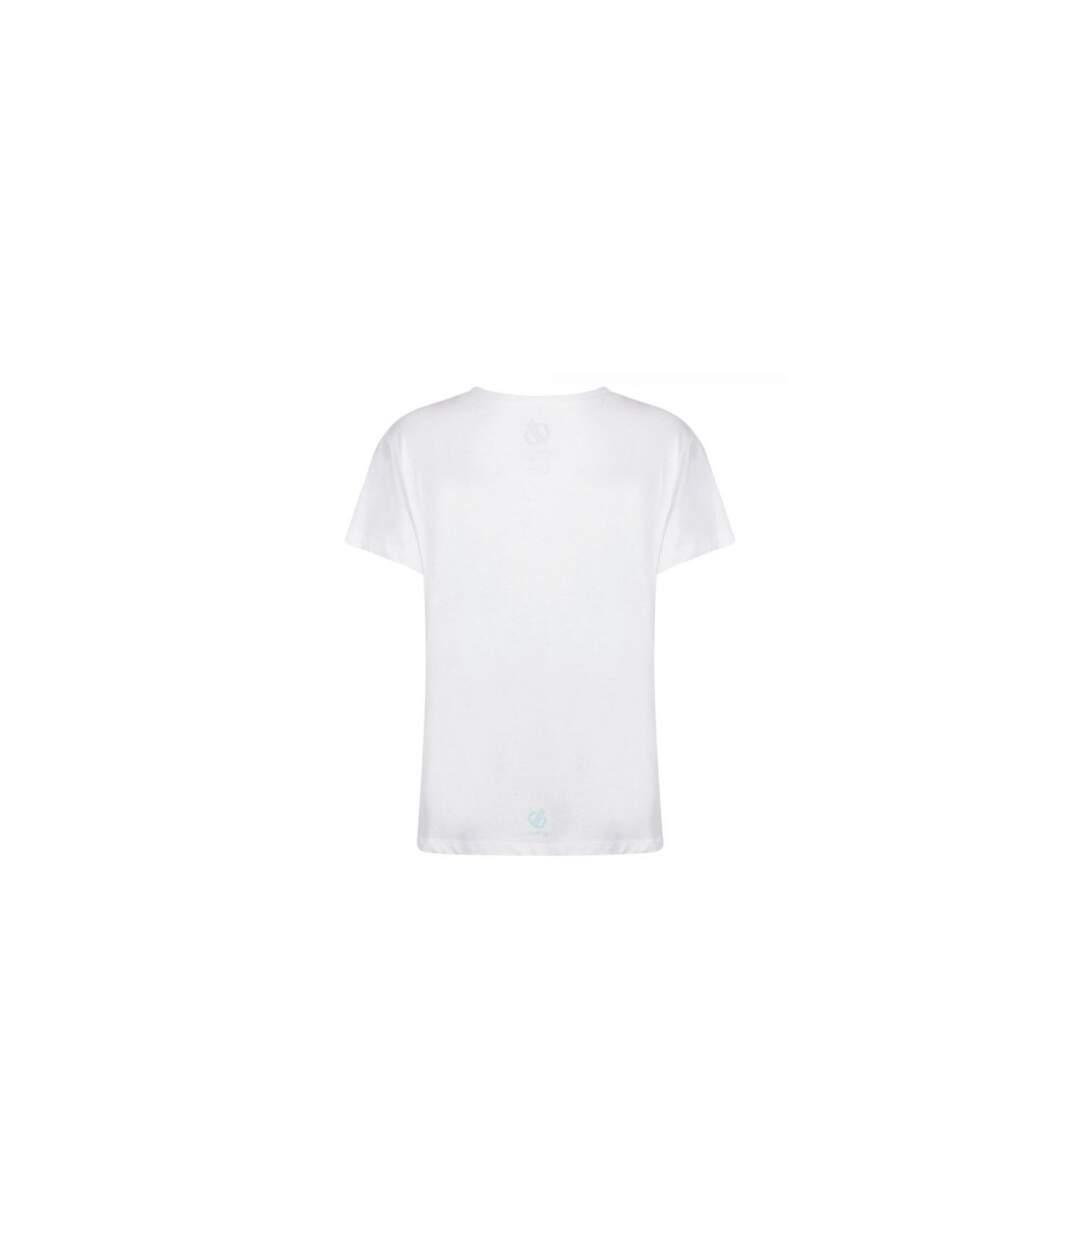 Dare 2B - T-Shirt Imprimé Glow Up - Femme (Blanc) - UTRG4277